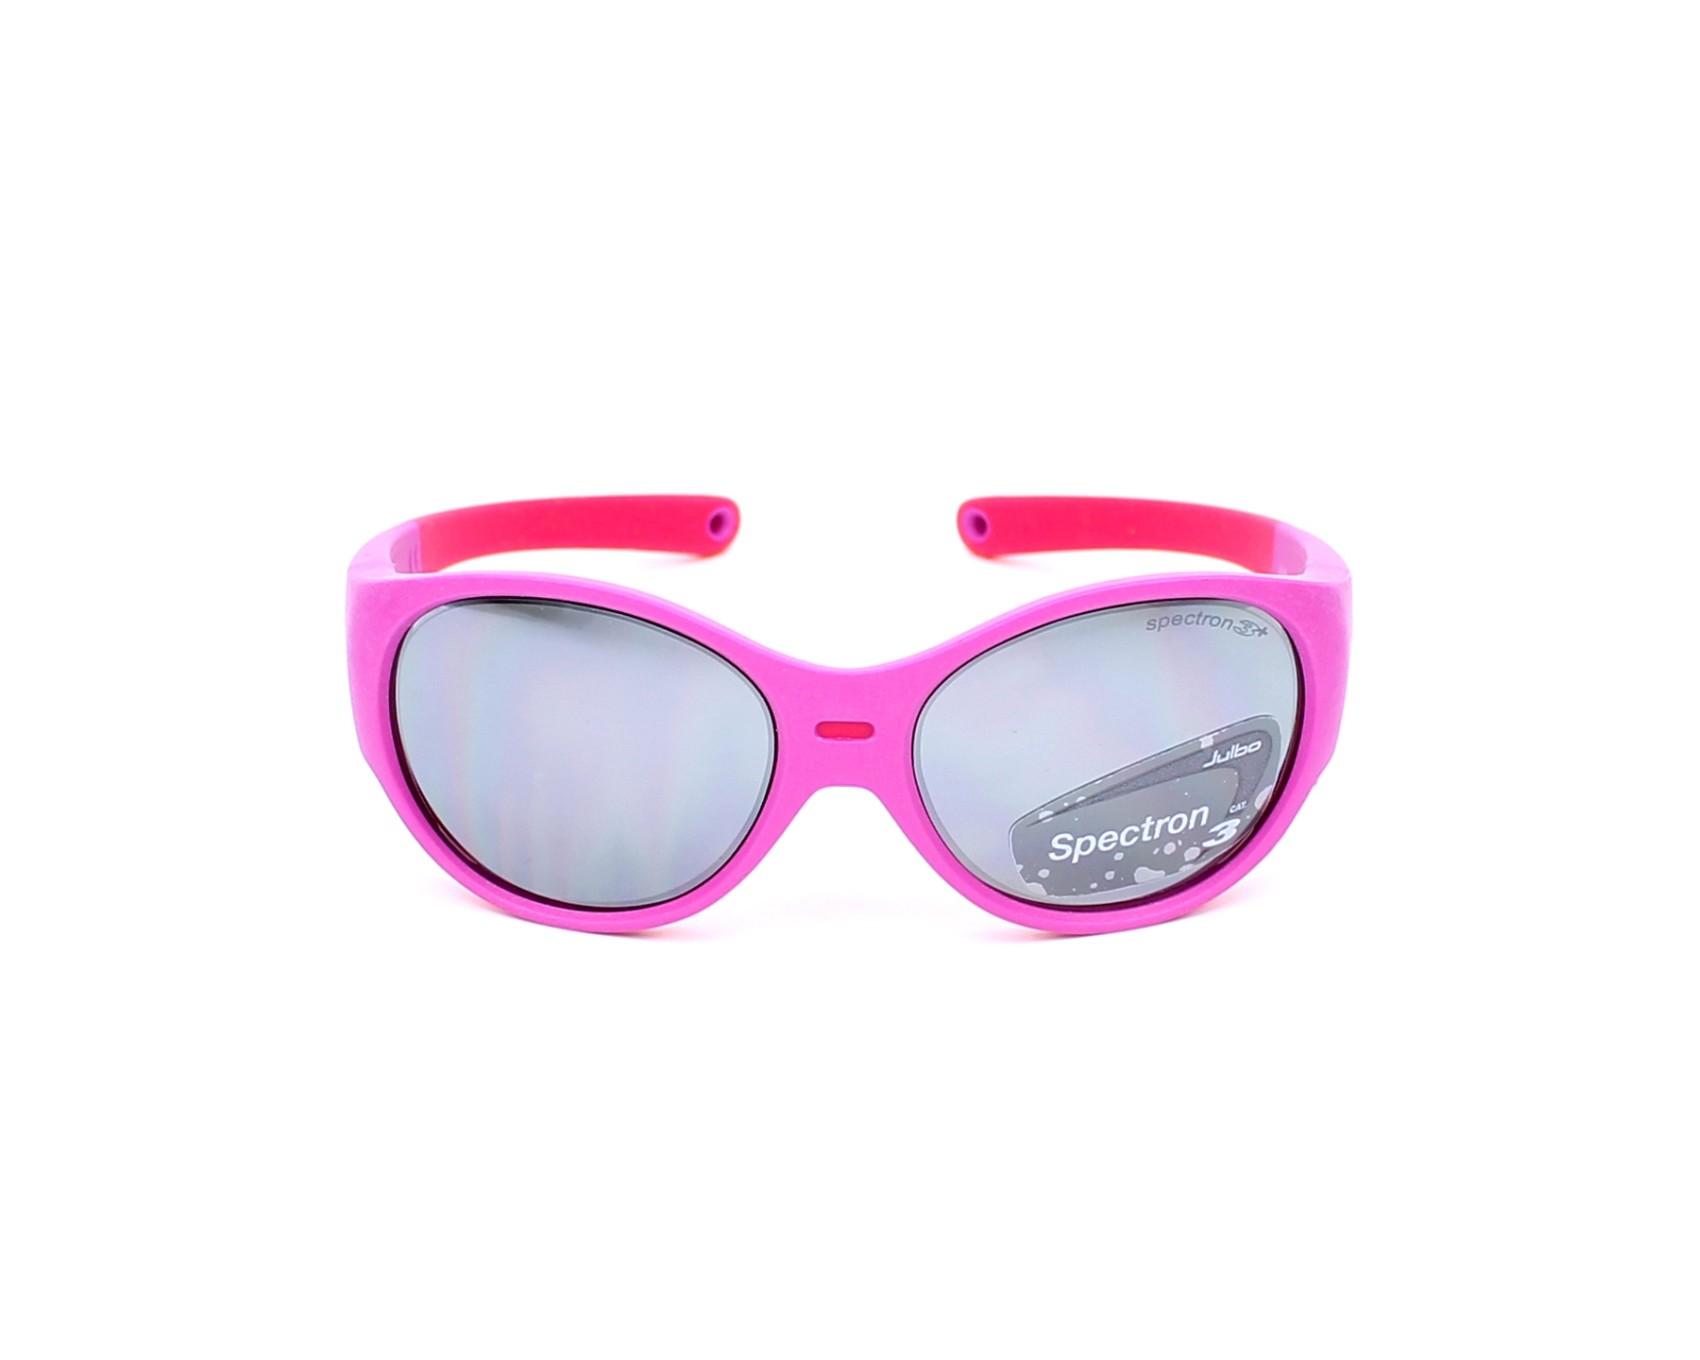 b8bf8100f112 Sunglasses Julbo J486 1118 - Purple Pink front view